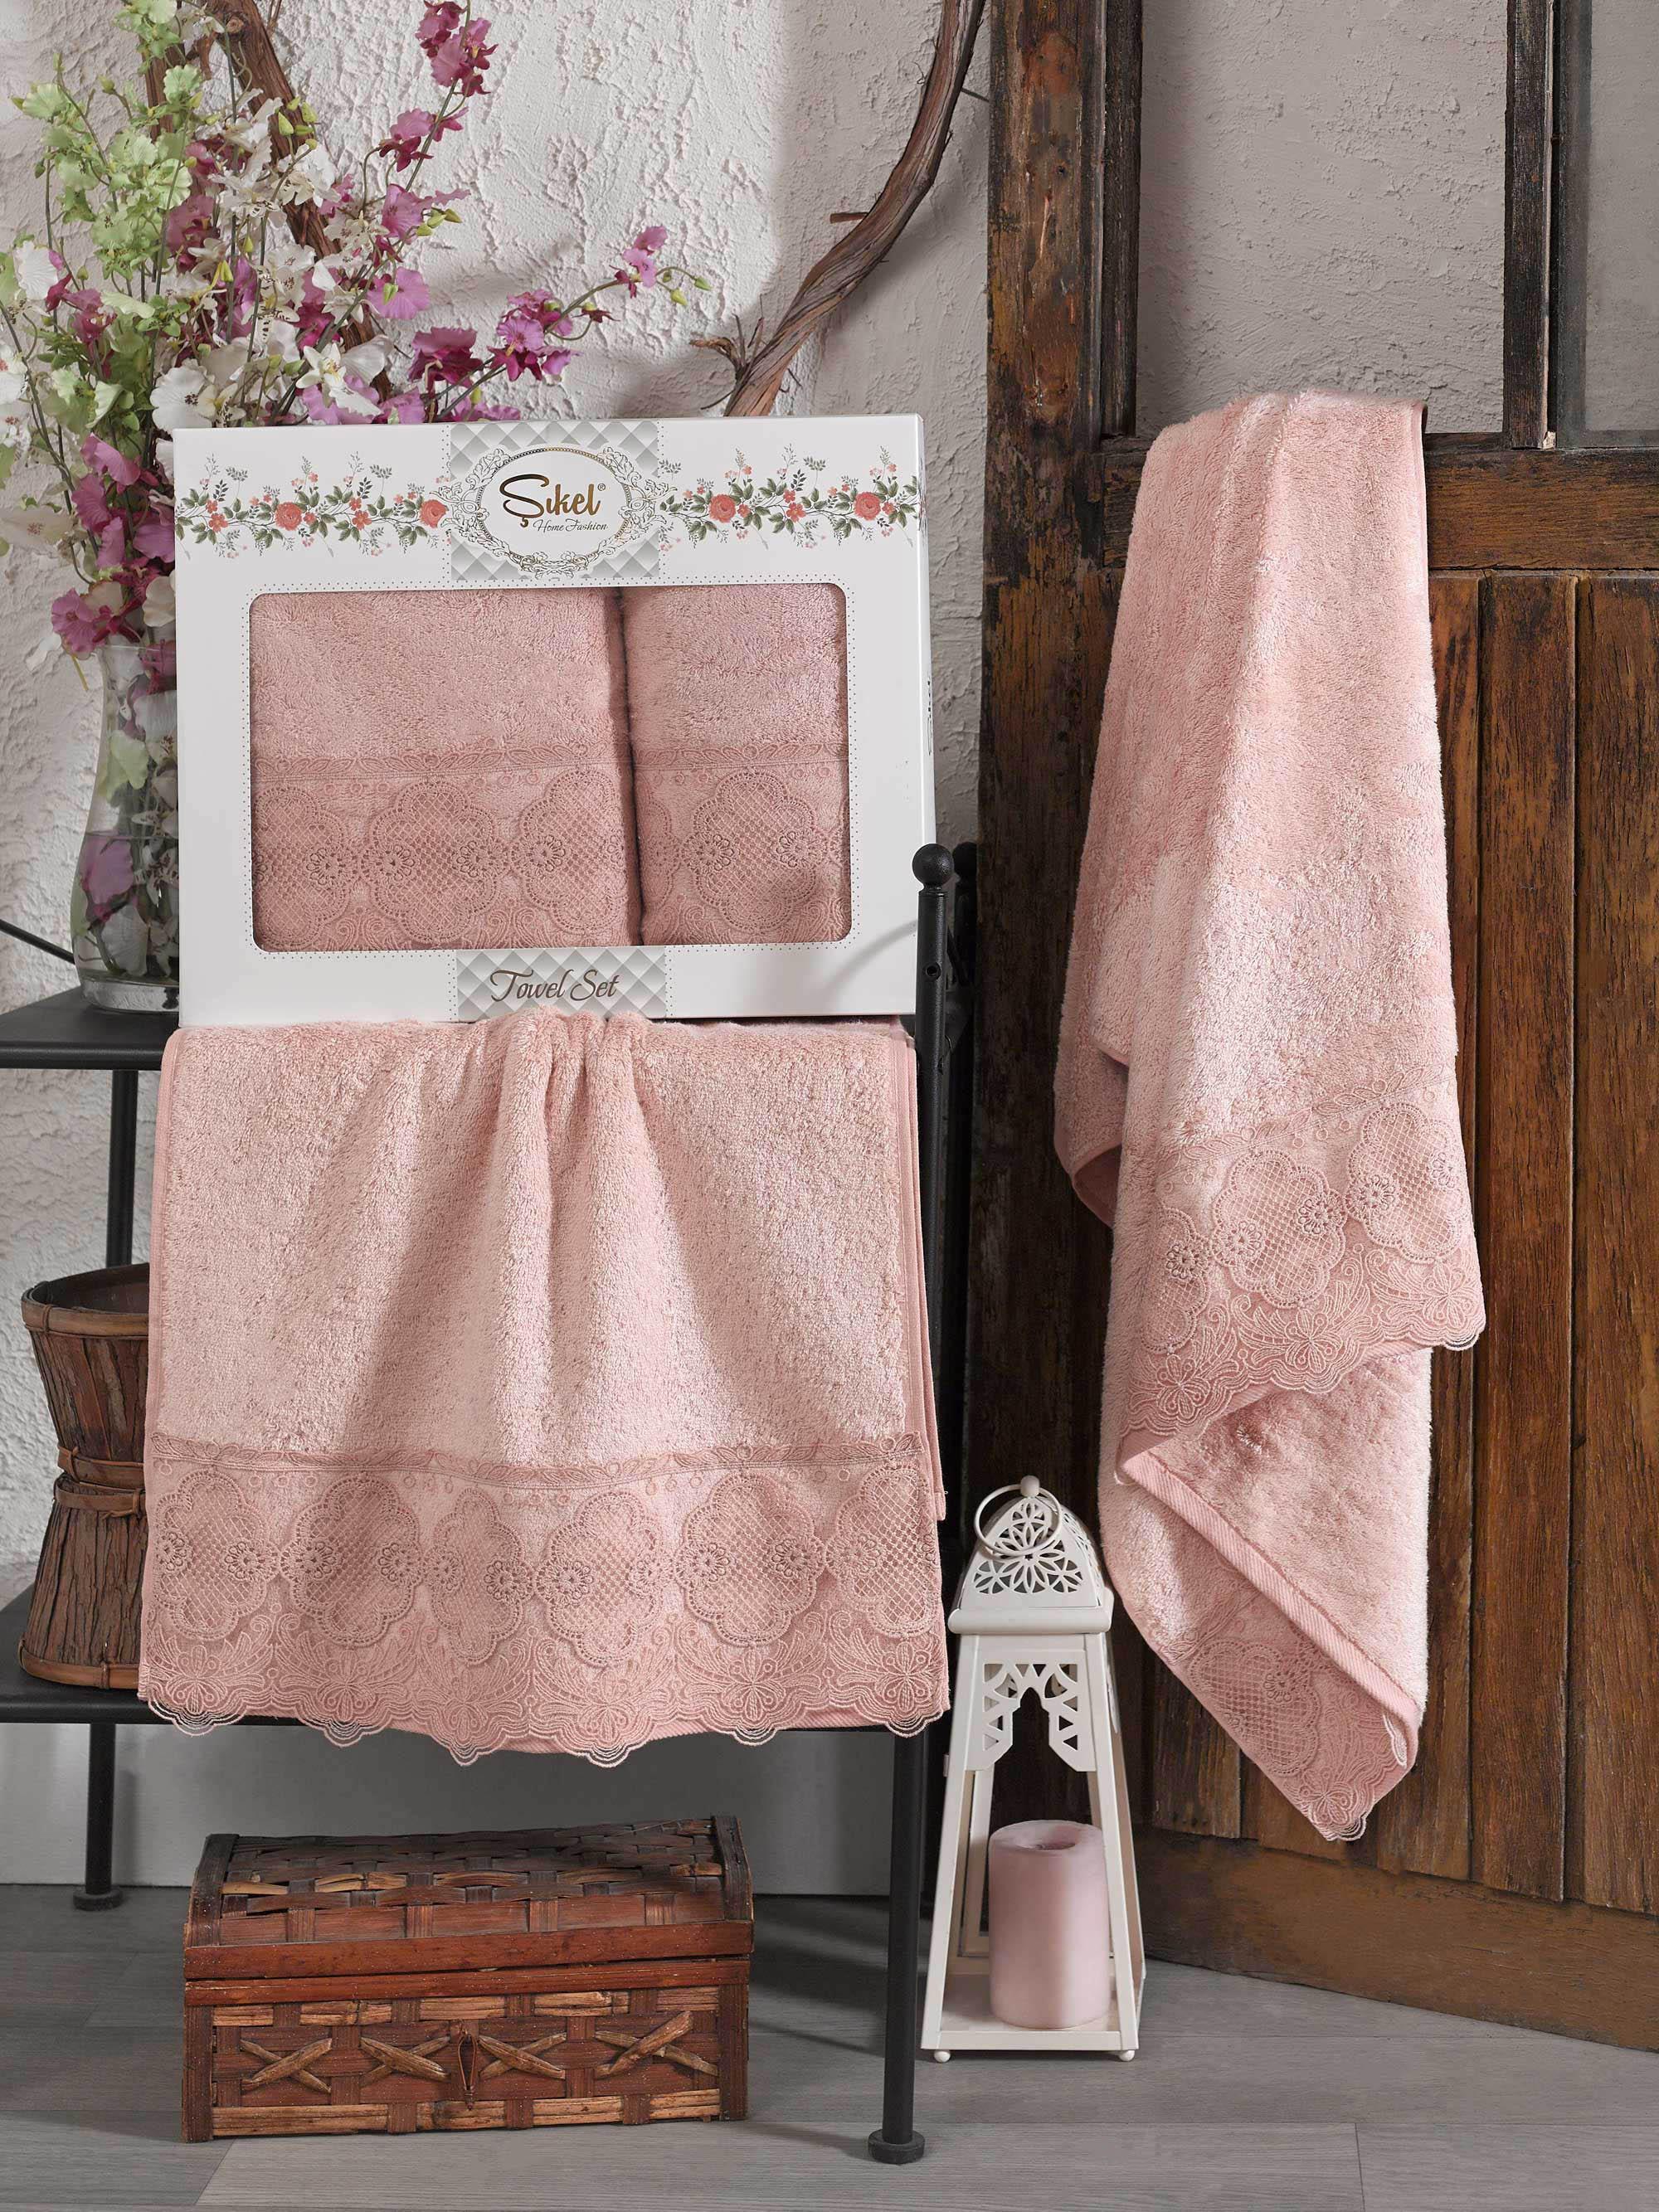 Полотенца Sikel Полотенце Solemare Цвет: Пудра (50х90 см,70х140 см) полотенца sikel полотенце kanevice цвет пудра 50х90 см 70х140 см